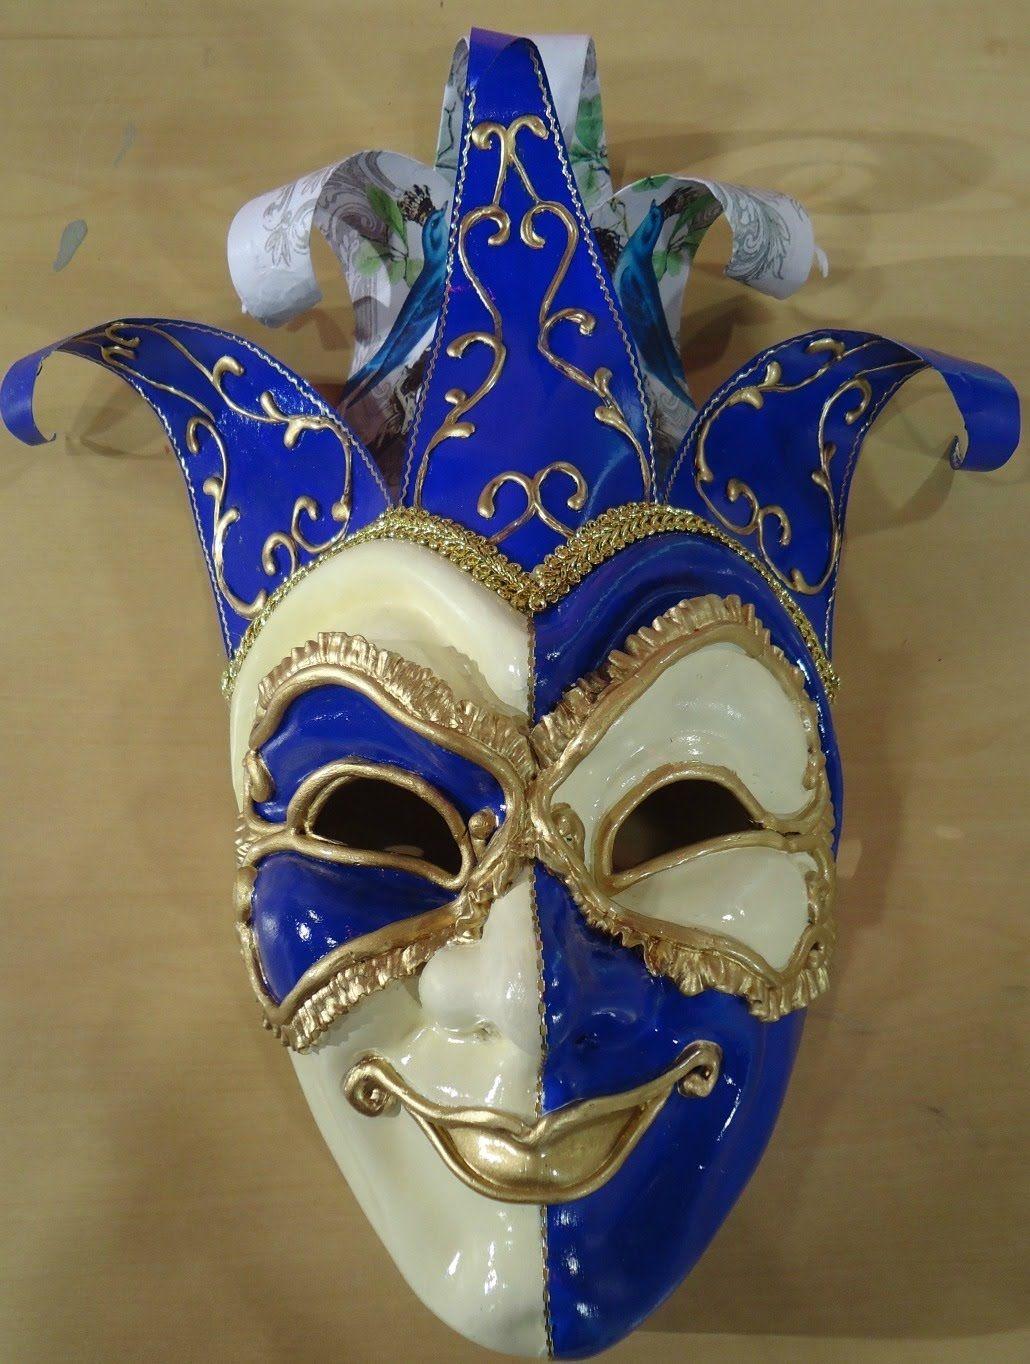 M scaras venecianas ideas para manualidades artesanias y costuras pinterest m scaras - Mascaras para carnaval manualidades ...